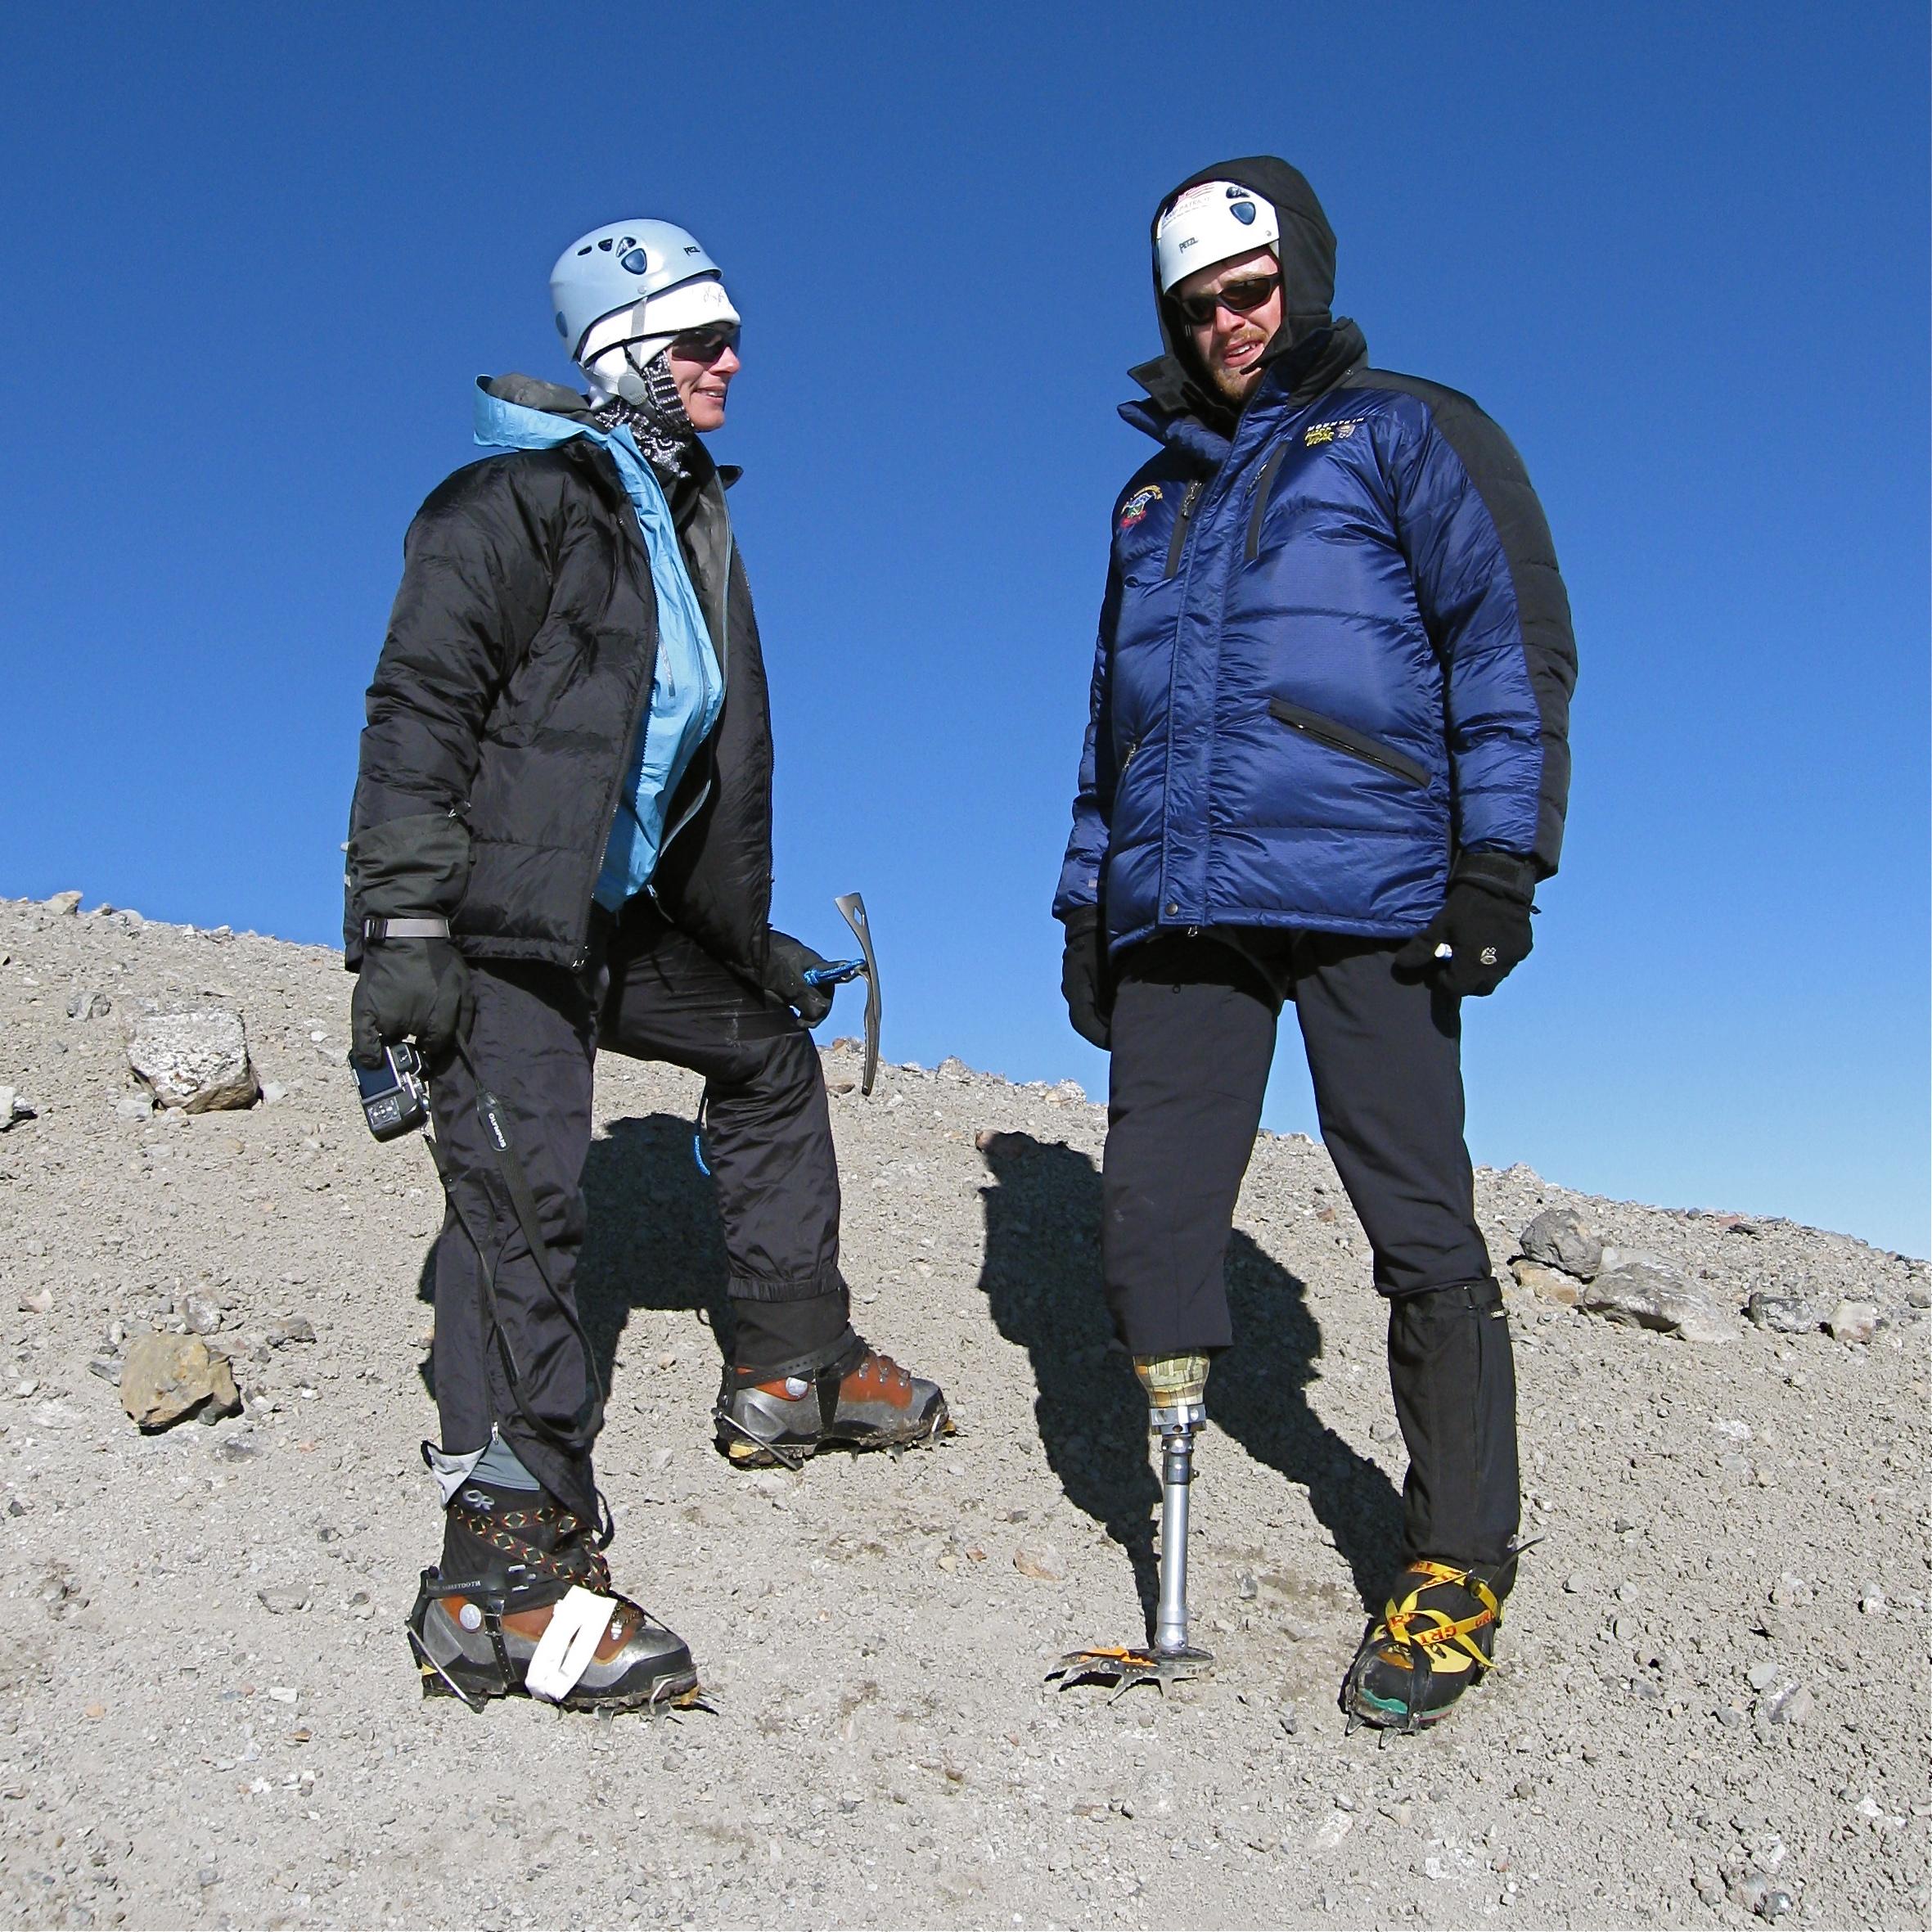 Denise with Iraq war veteran Chad Dukes. Mt.Rainier summit 2008.